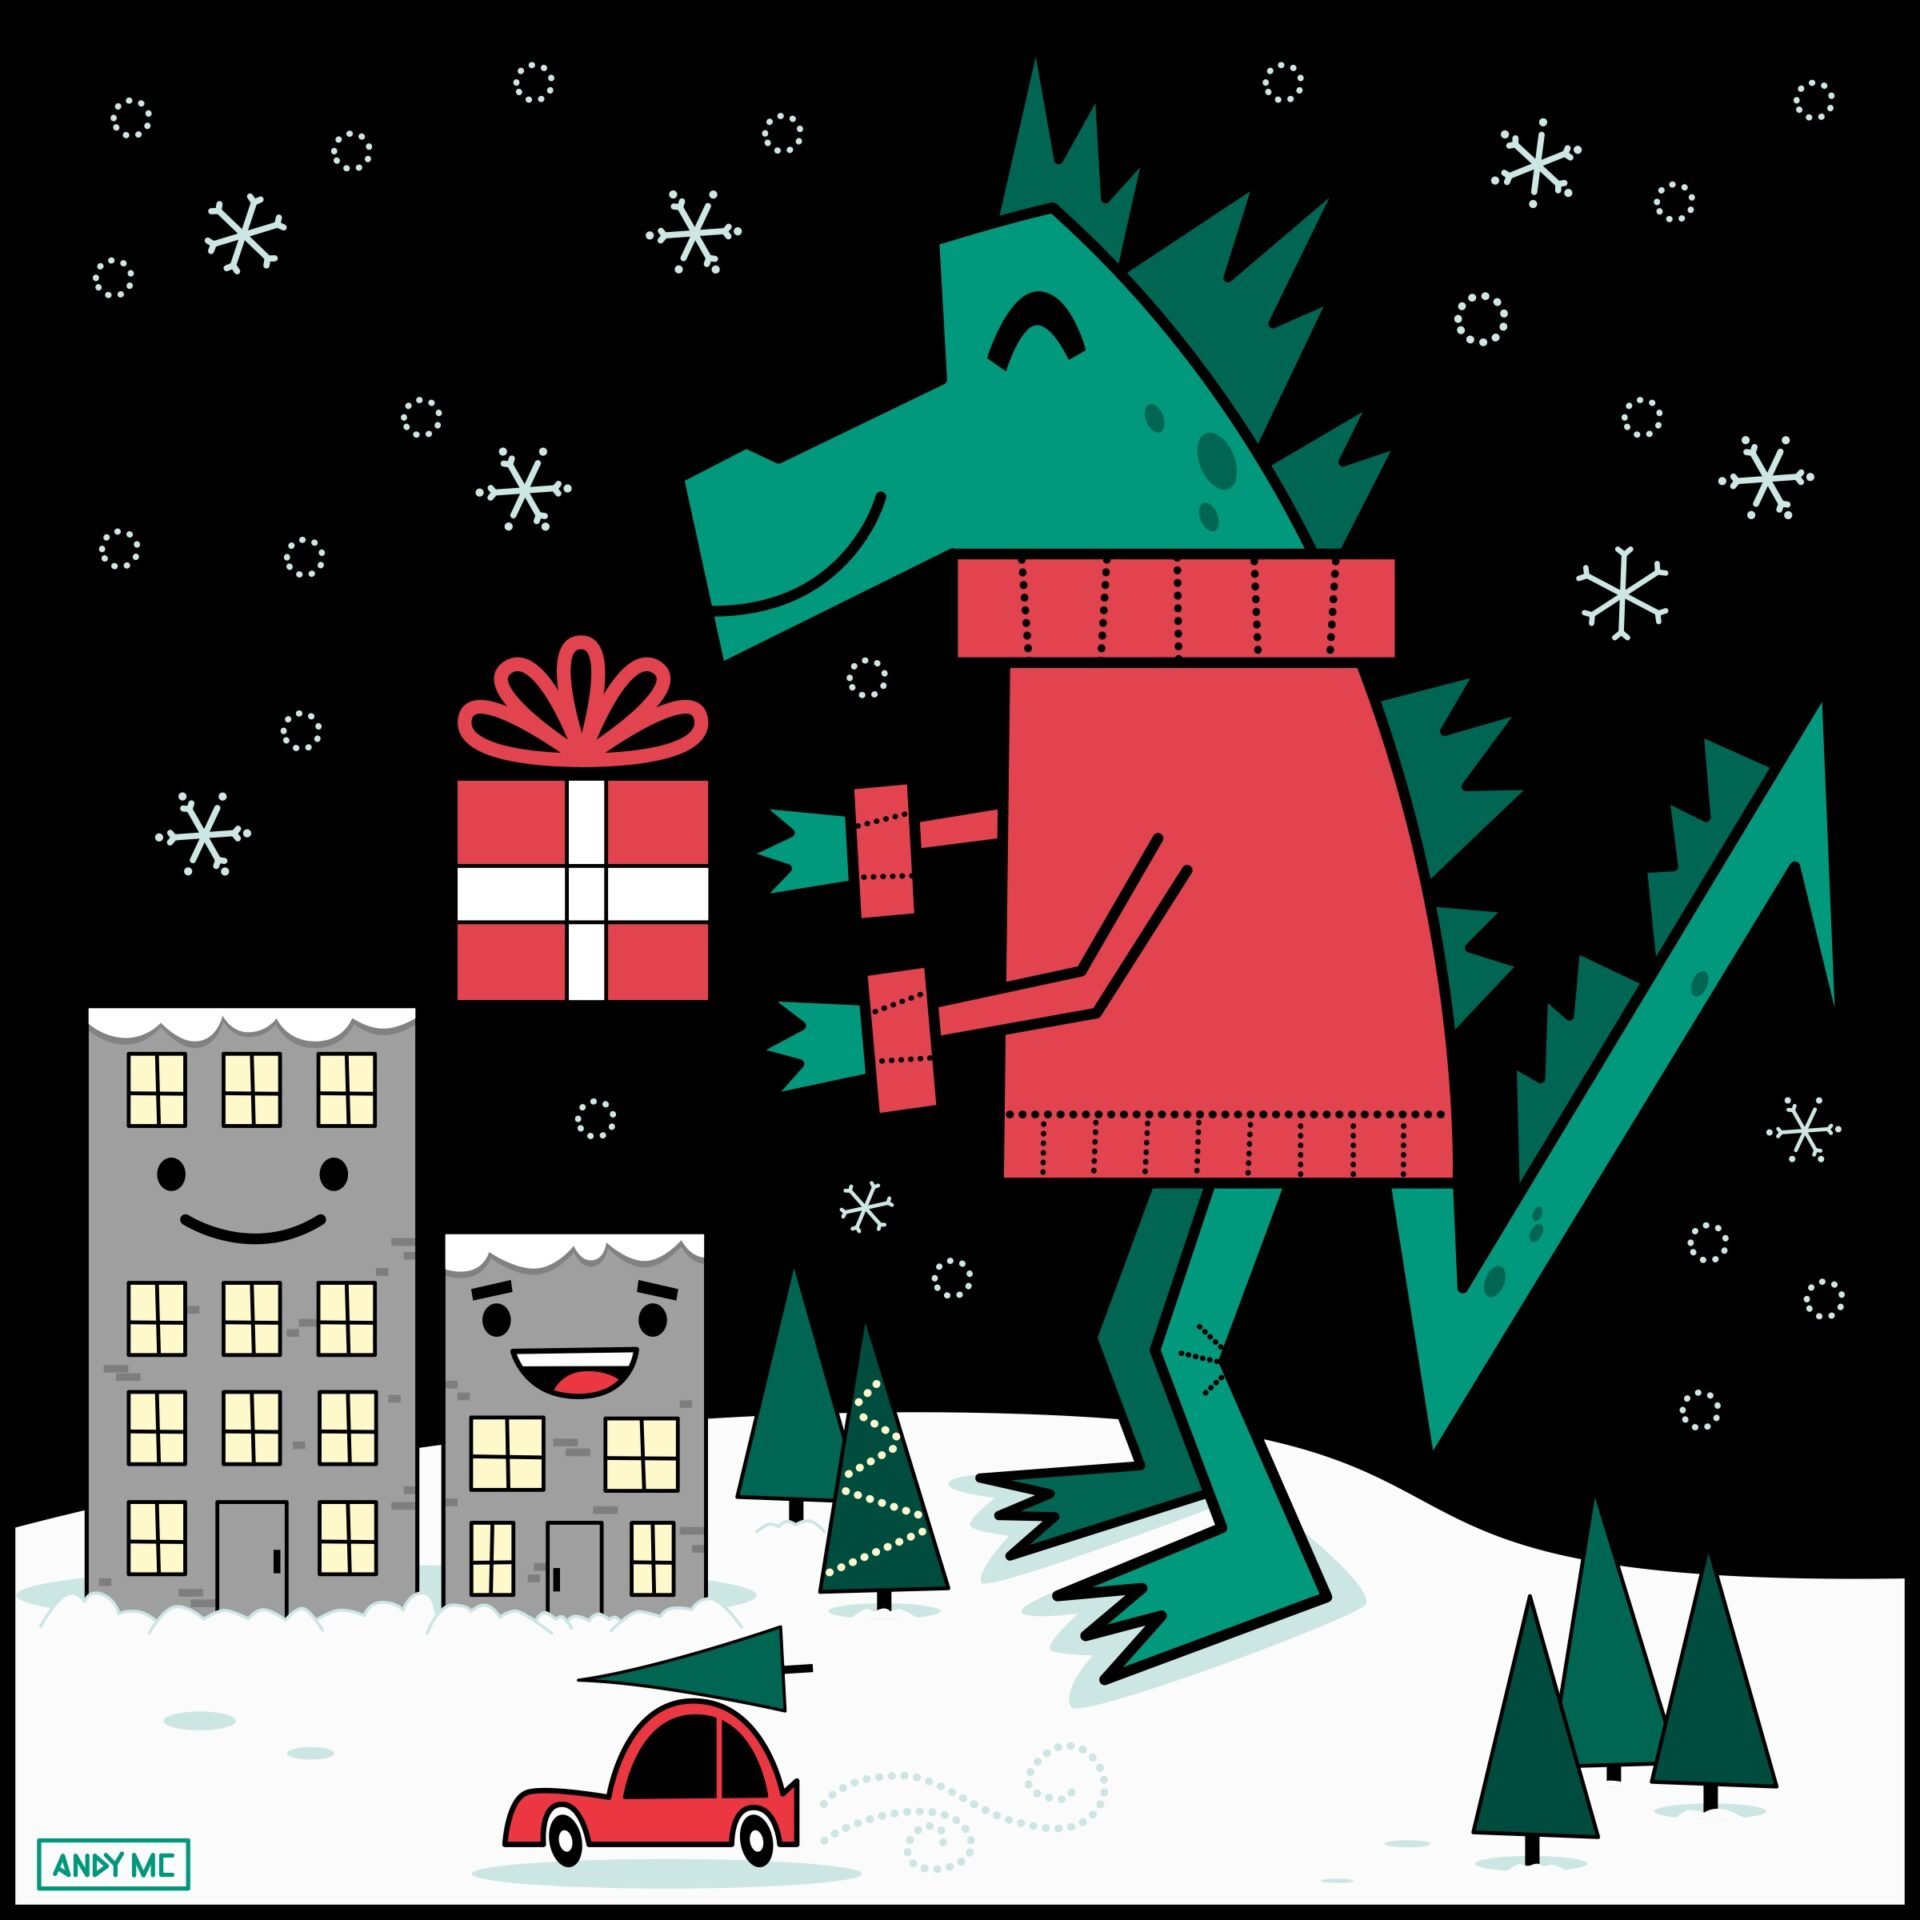 Kaiju Christmas illustration